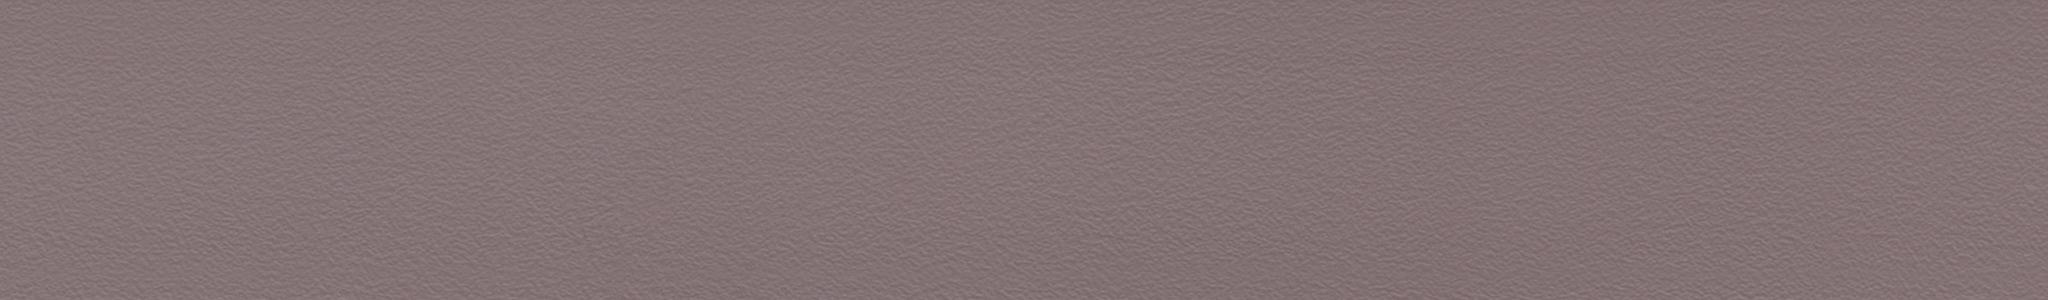 HU 187012 ABS Edge Brown Coco Pearl XG